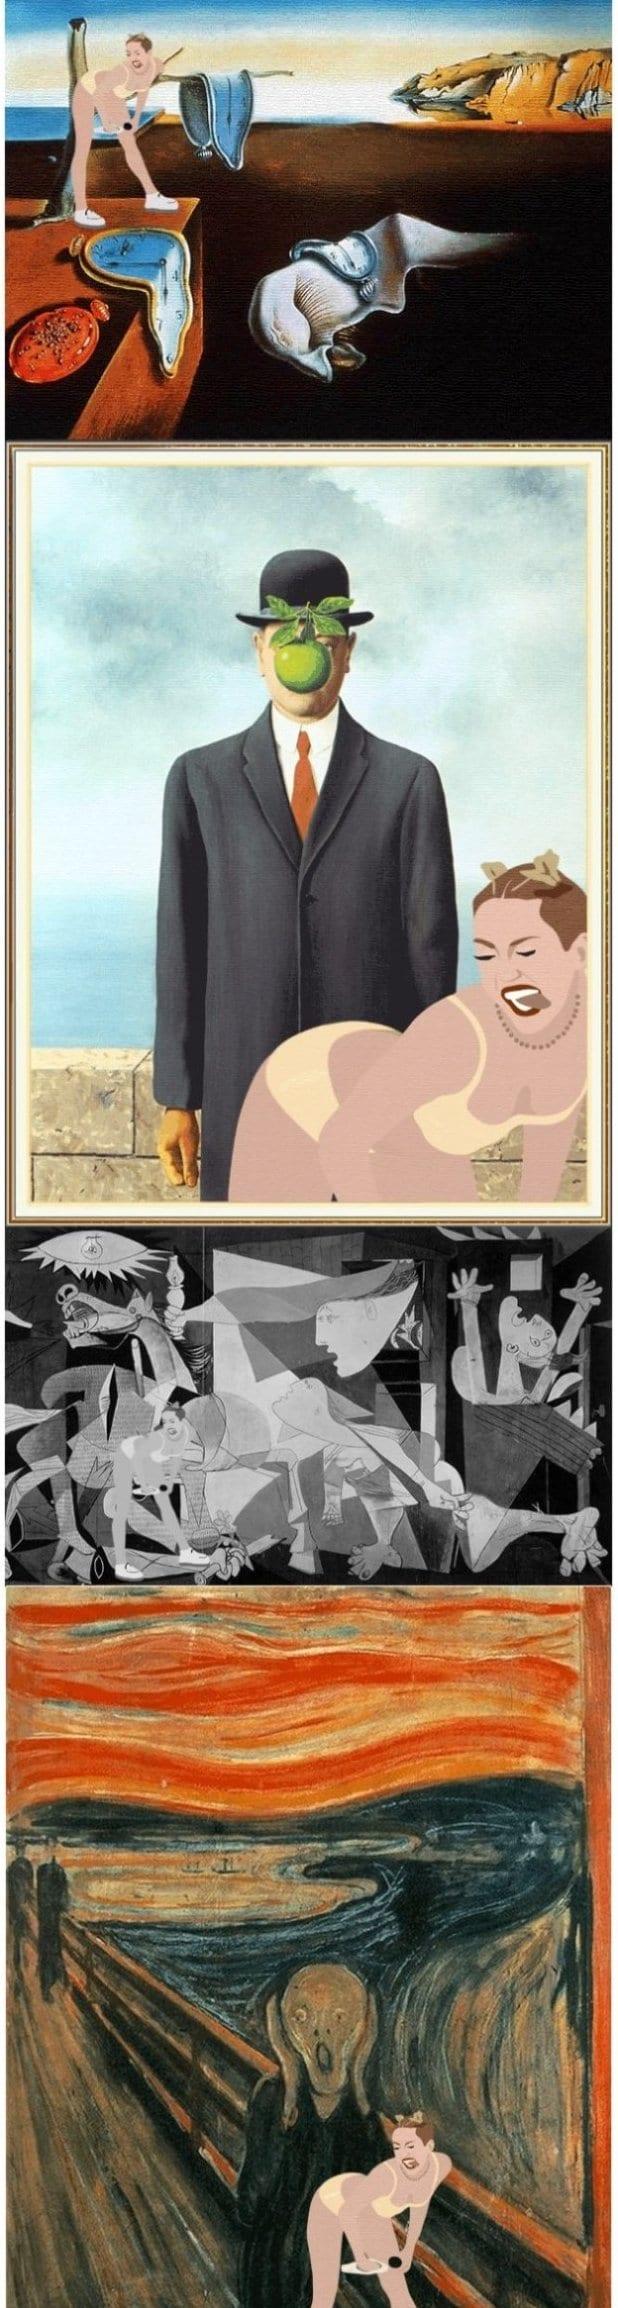 funny-image-2014-twerks-of-art